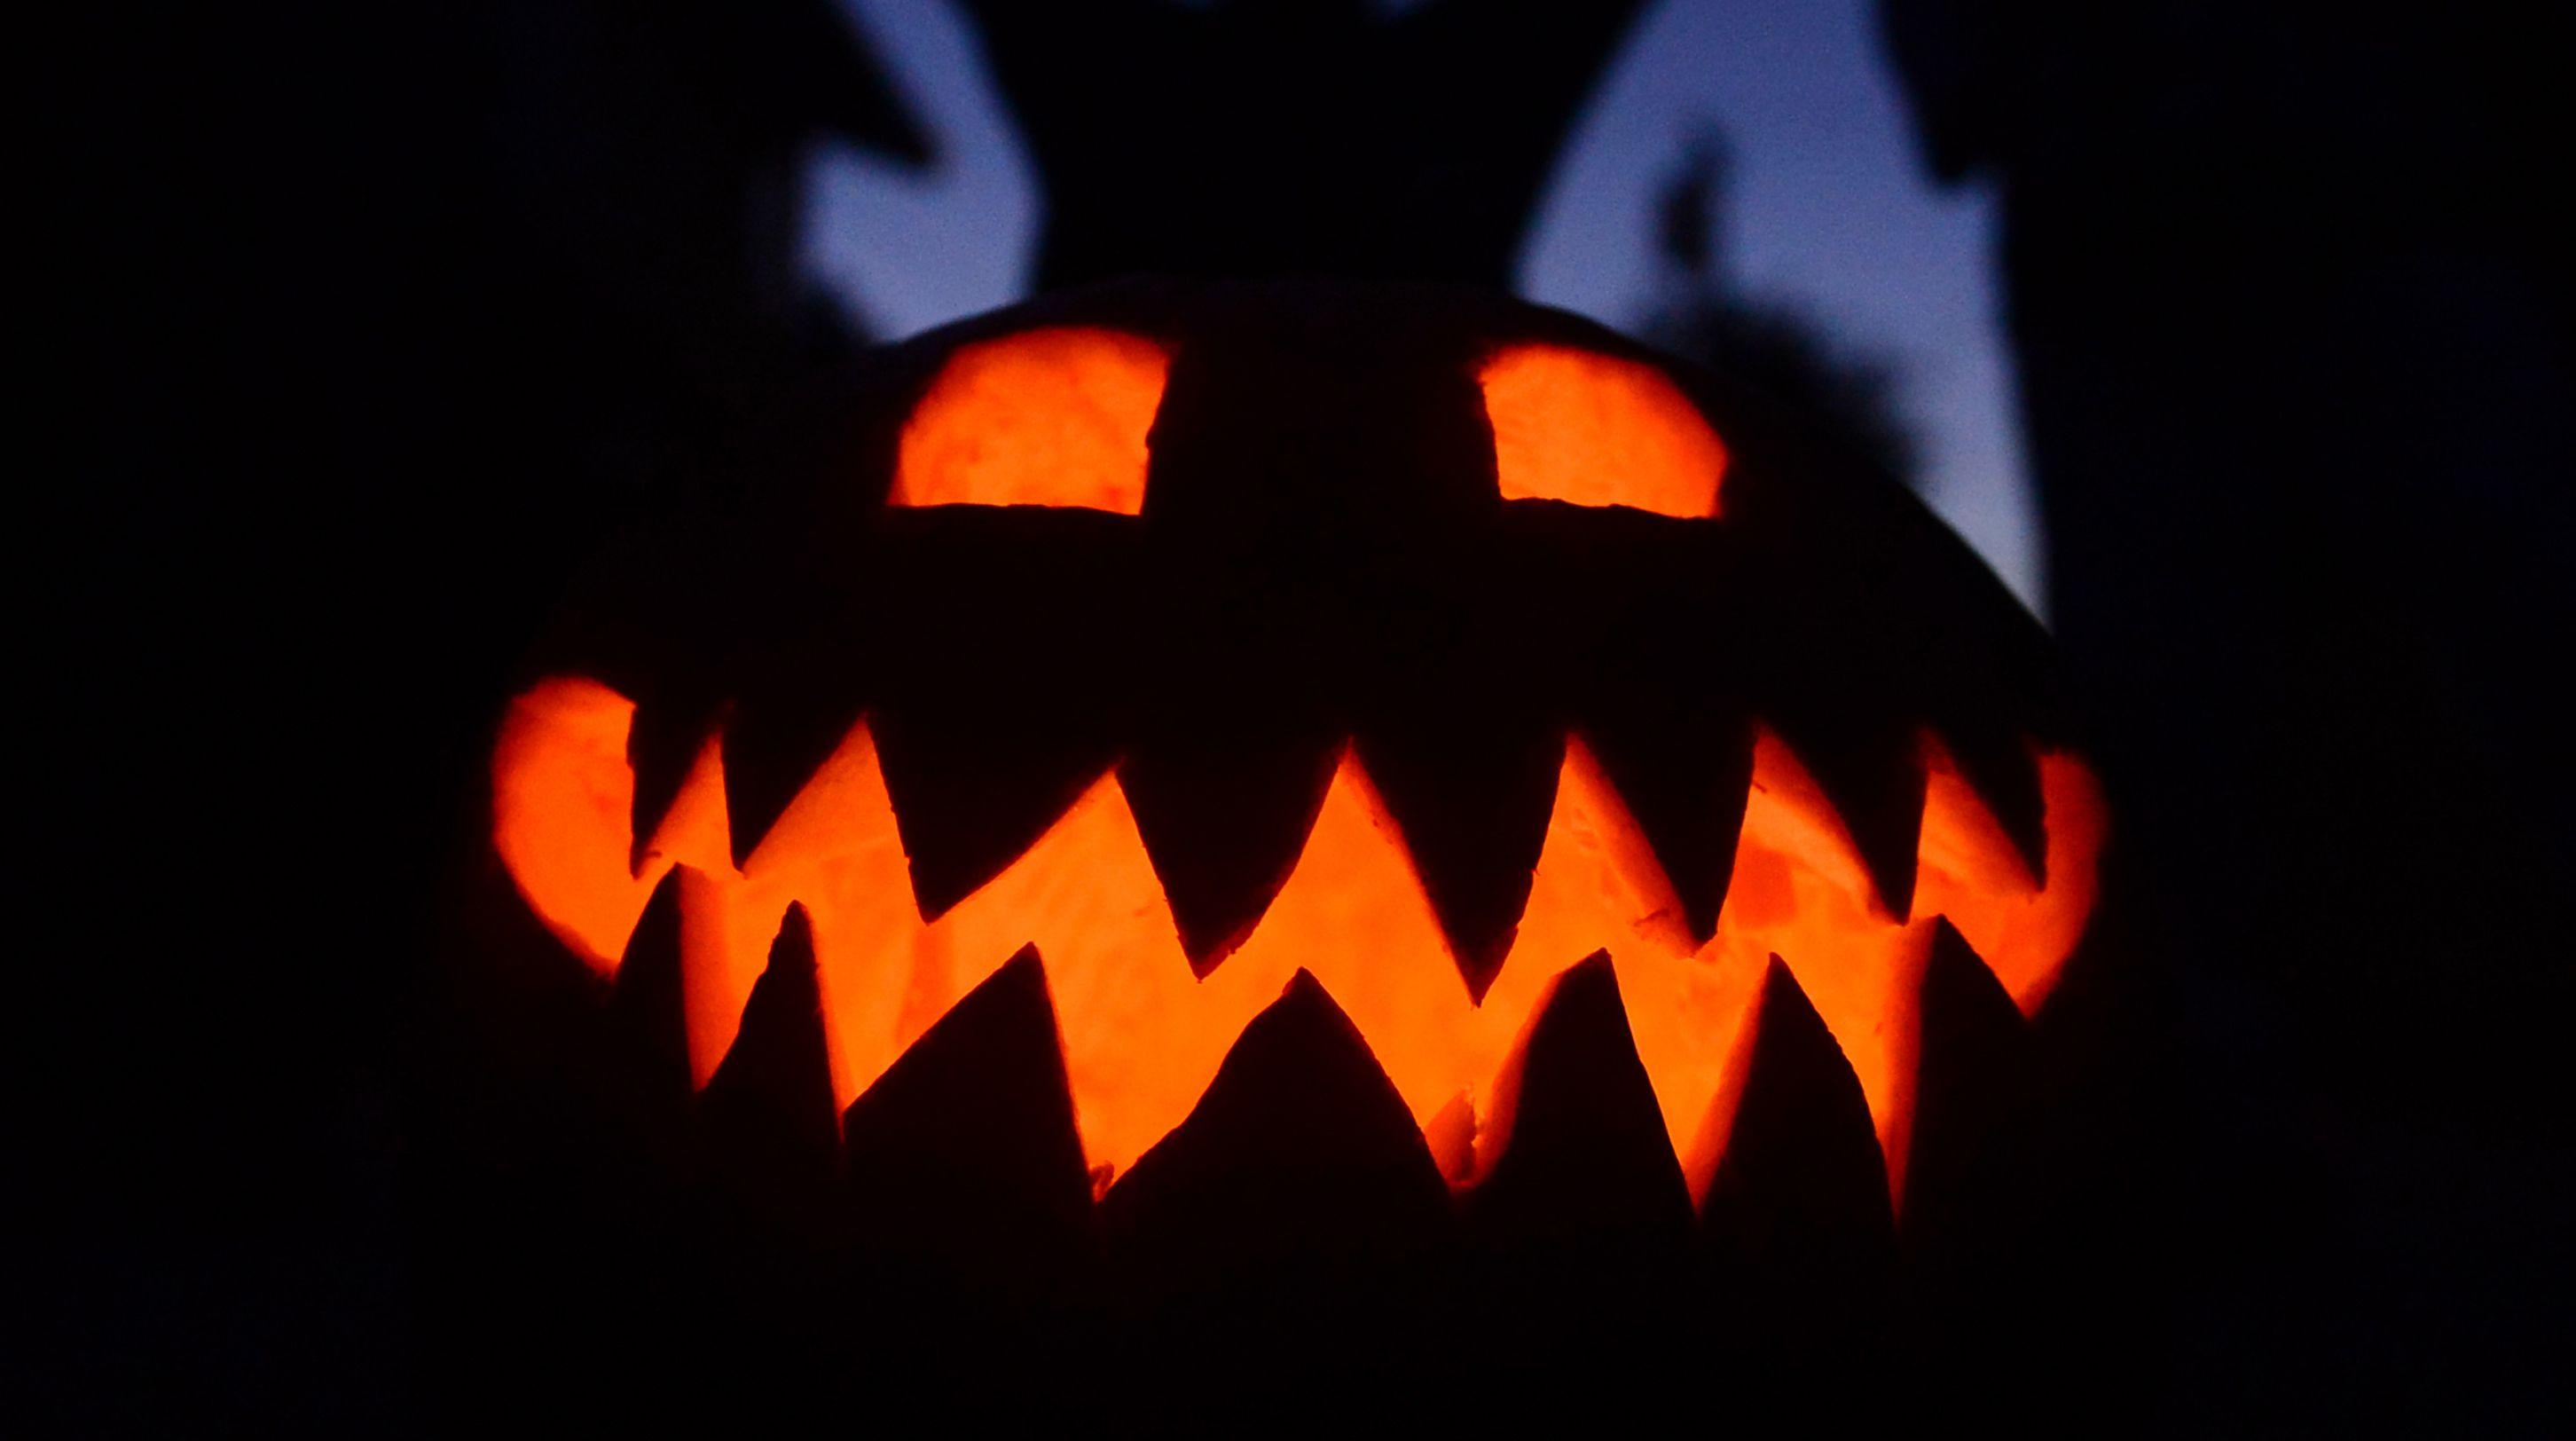 Halloween Events Syracuse Ny 2020 Lights on the Lake, Fright Night creators to bring new Halloween